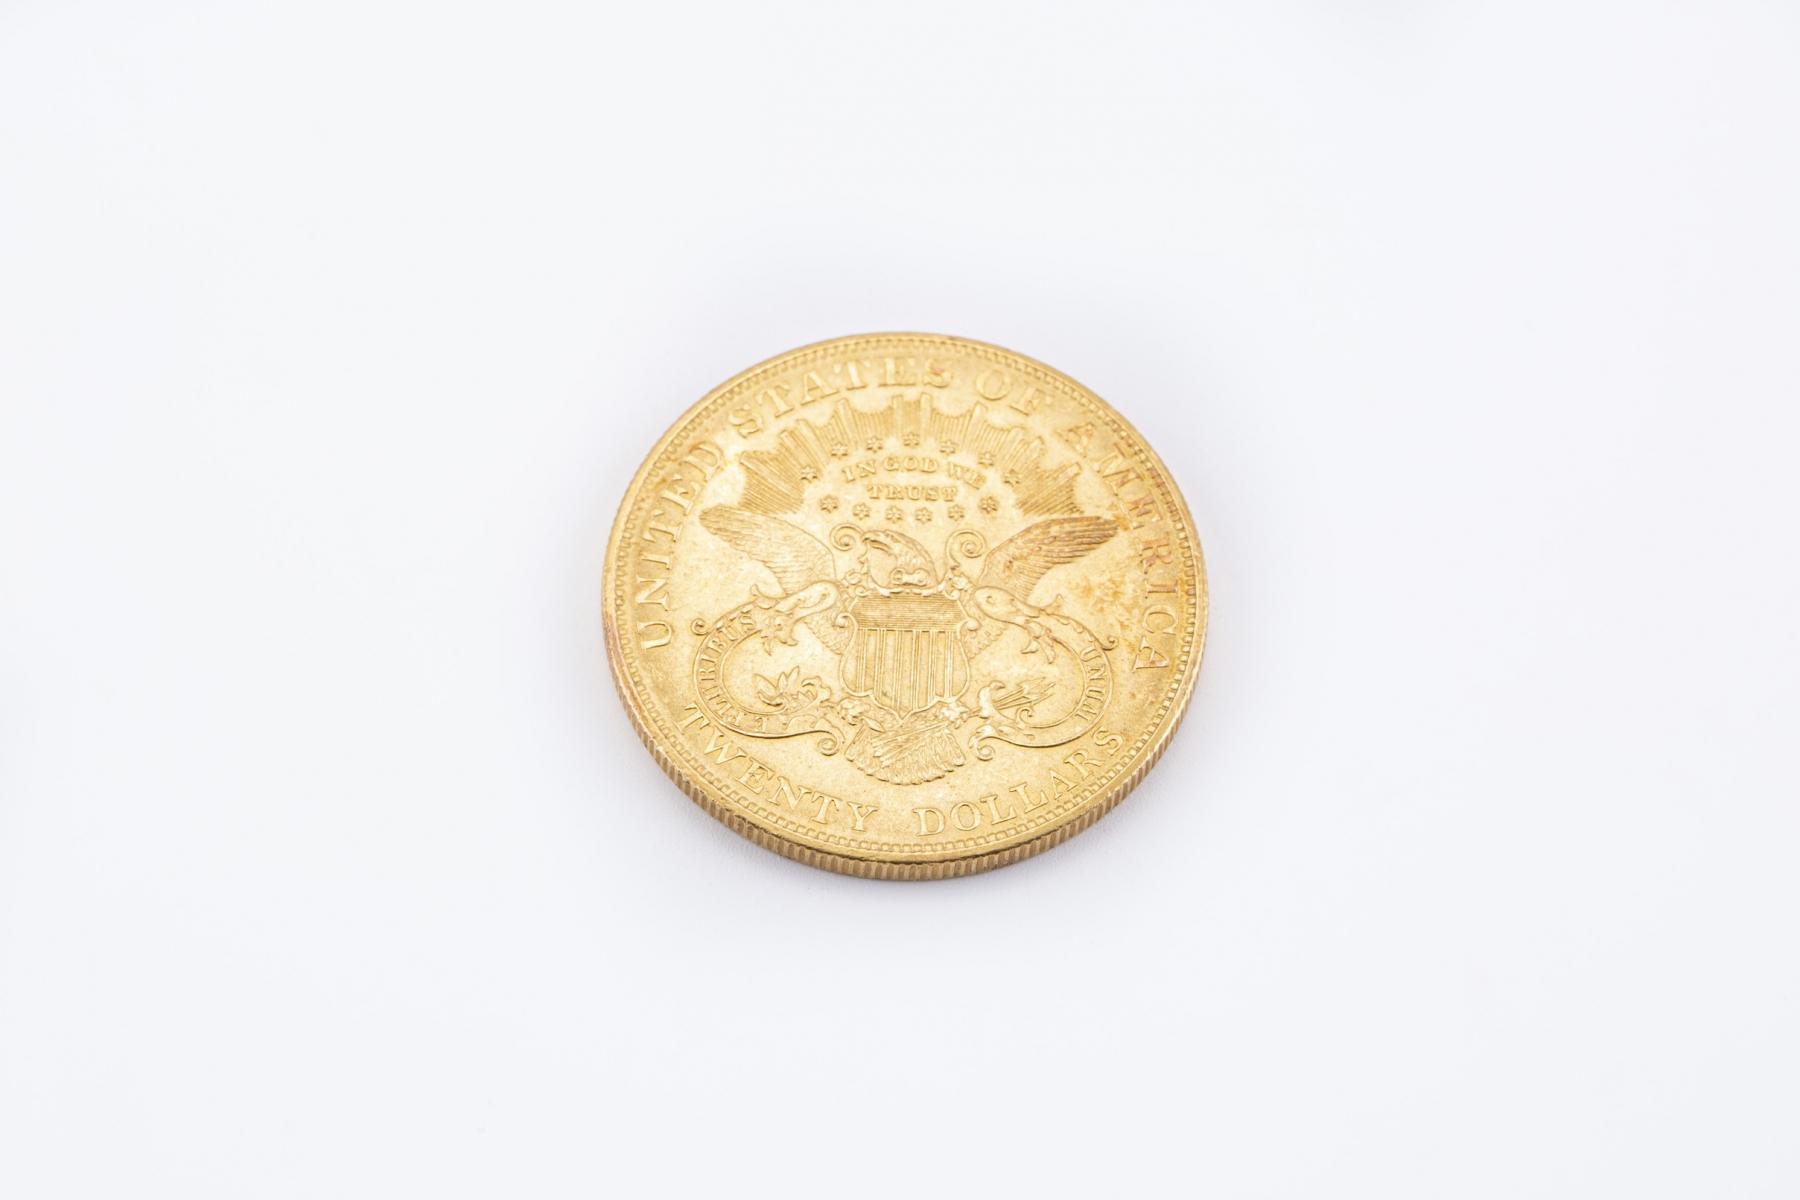 2 (1) - Pièce de 20 dollars or datée 1904. Adjugé 1416€